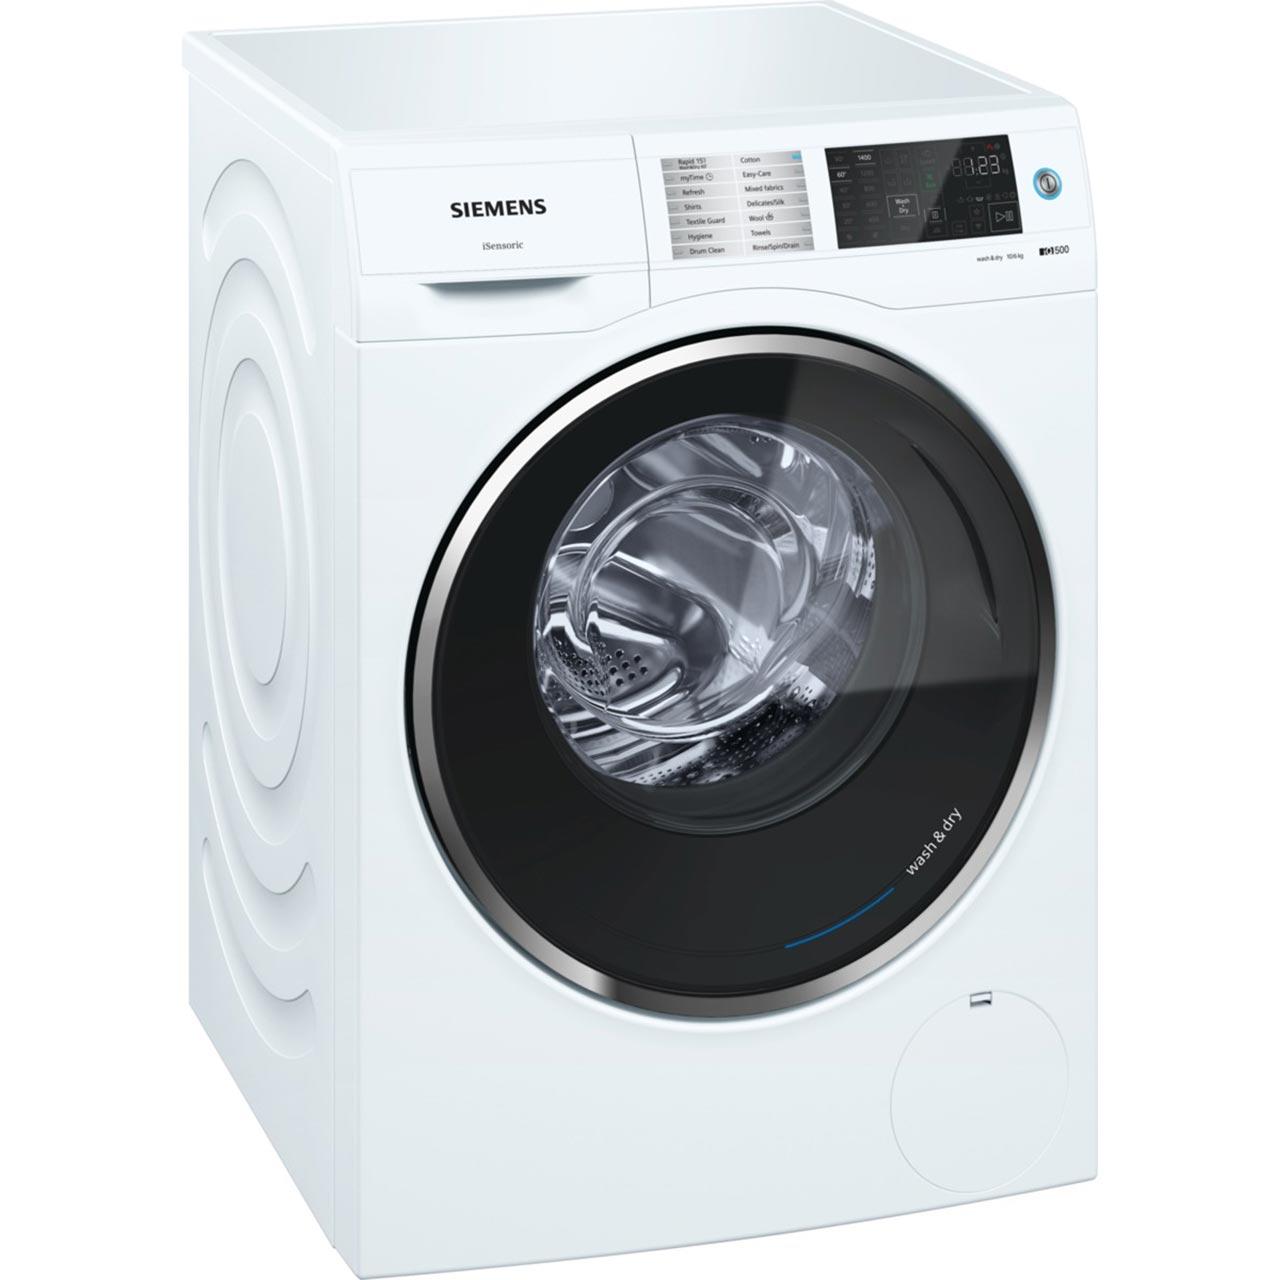 Wd14u520gb Wh Siemens Washer Dryer 10kg Ao Com